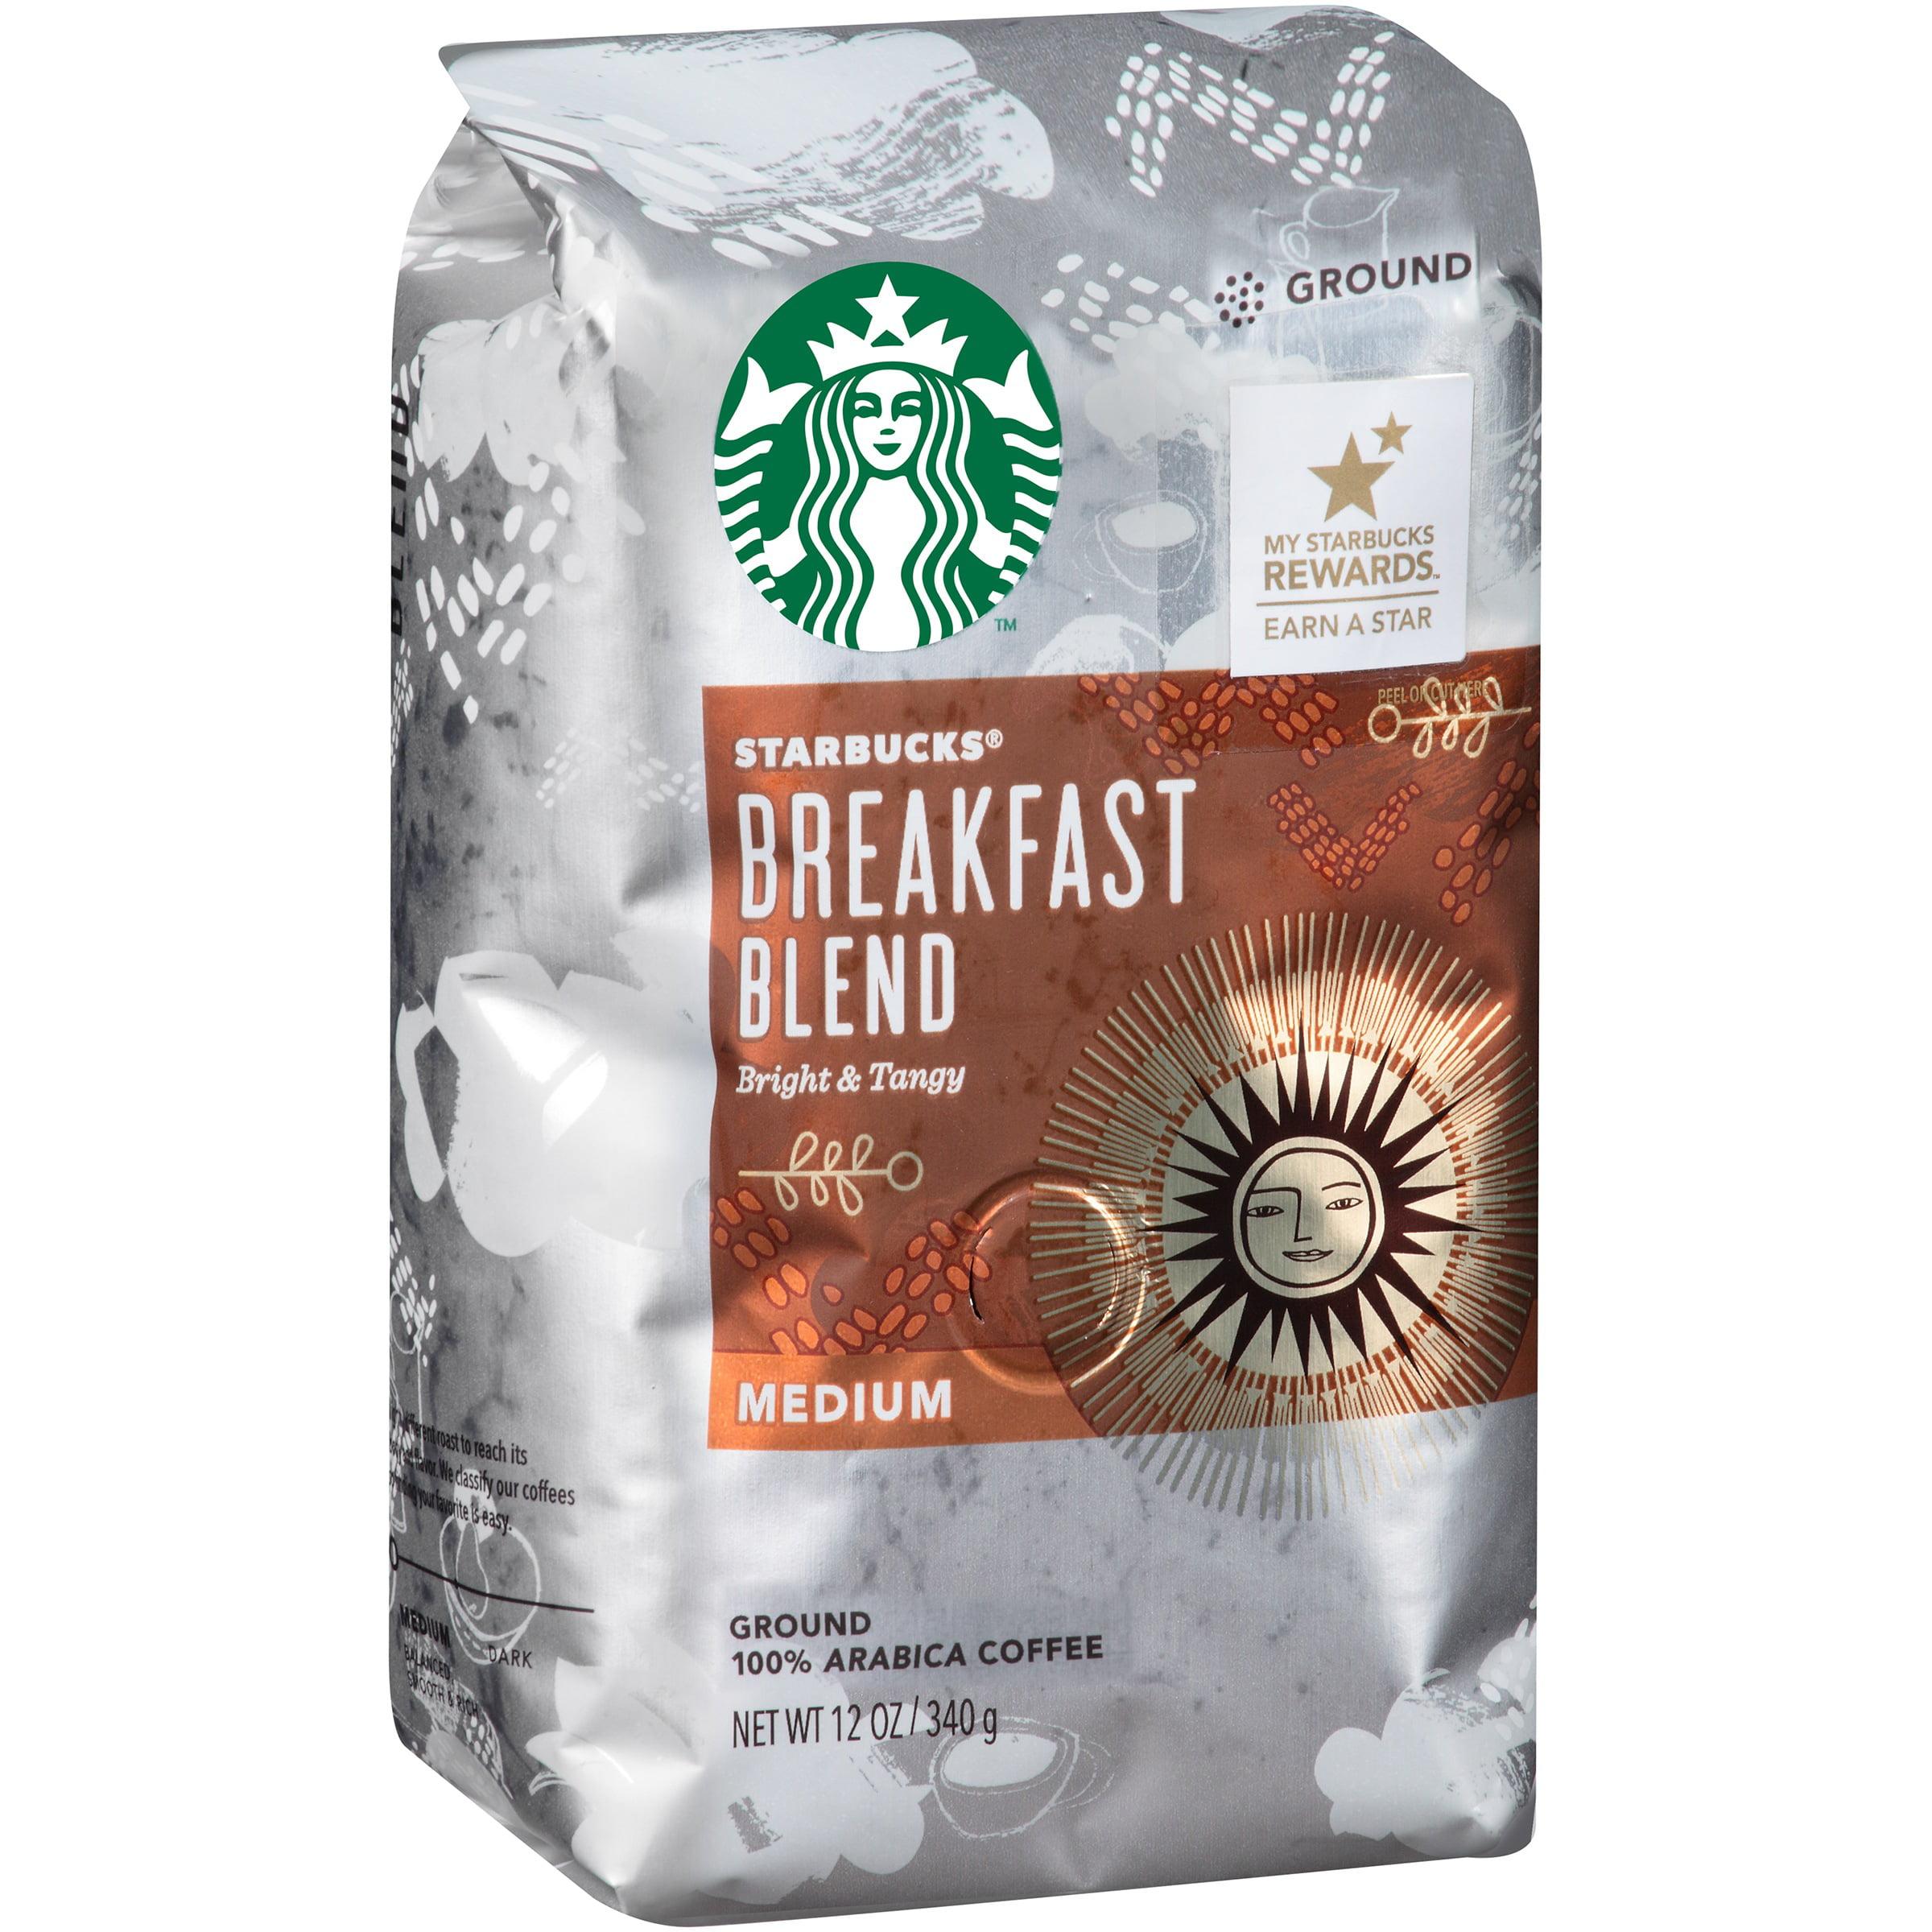 Starbucks Breakfast Blend Medium Ground Coffee 12 oz. Bag by STARBUCKS COFFEE COMPANY